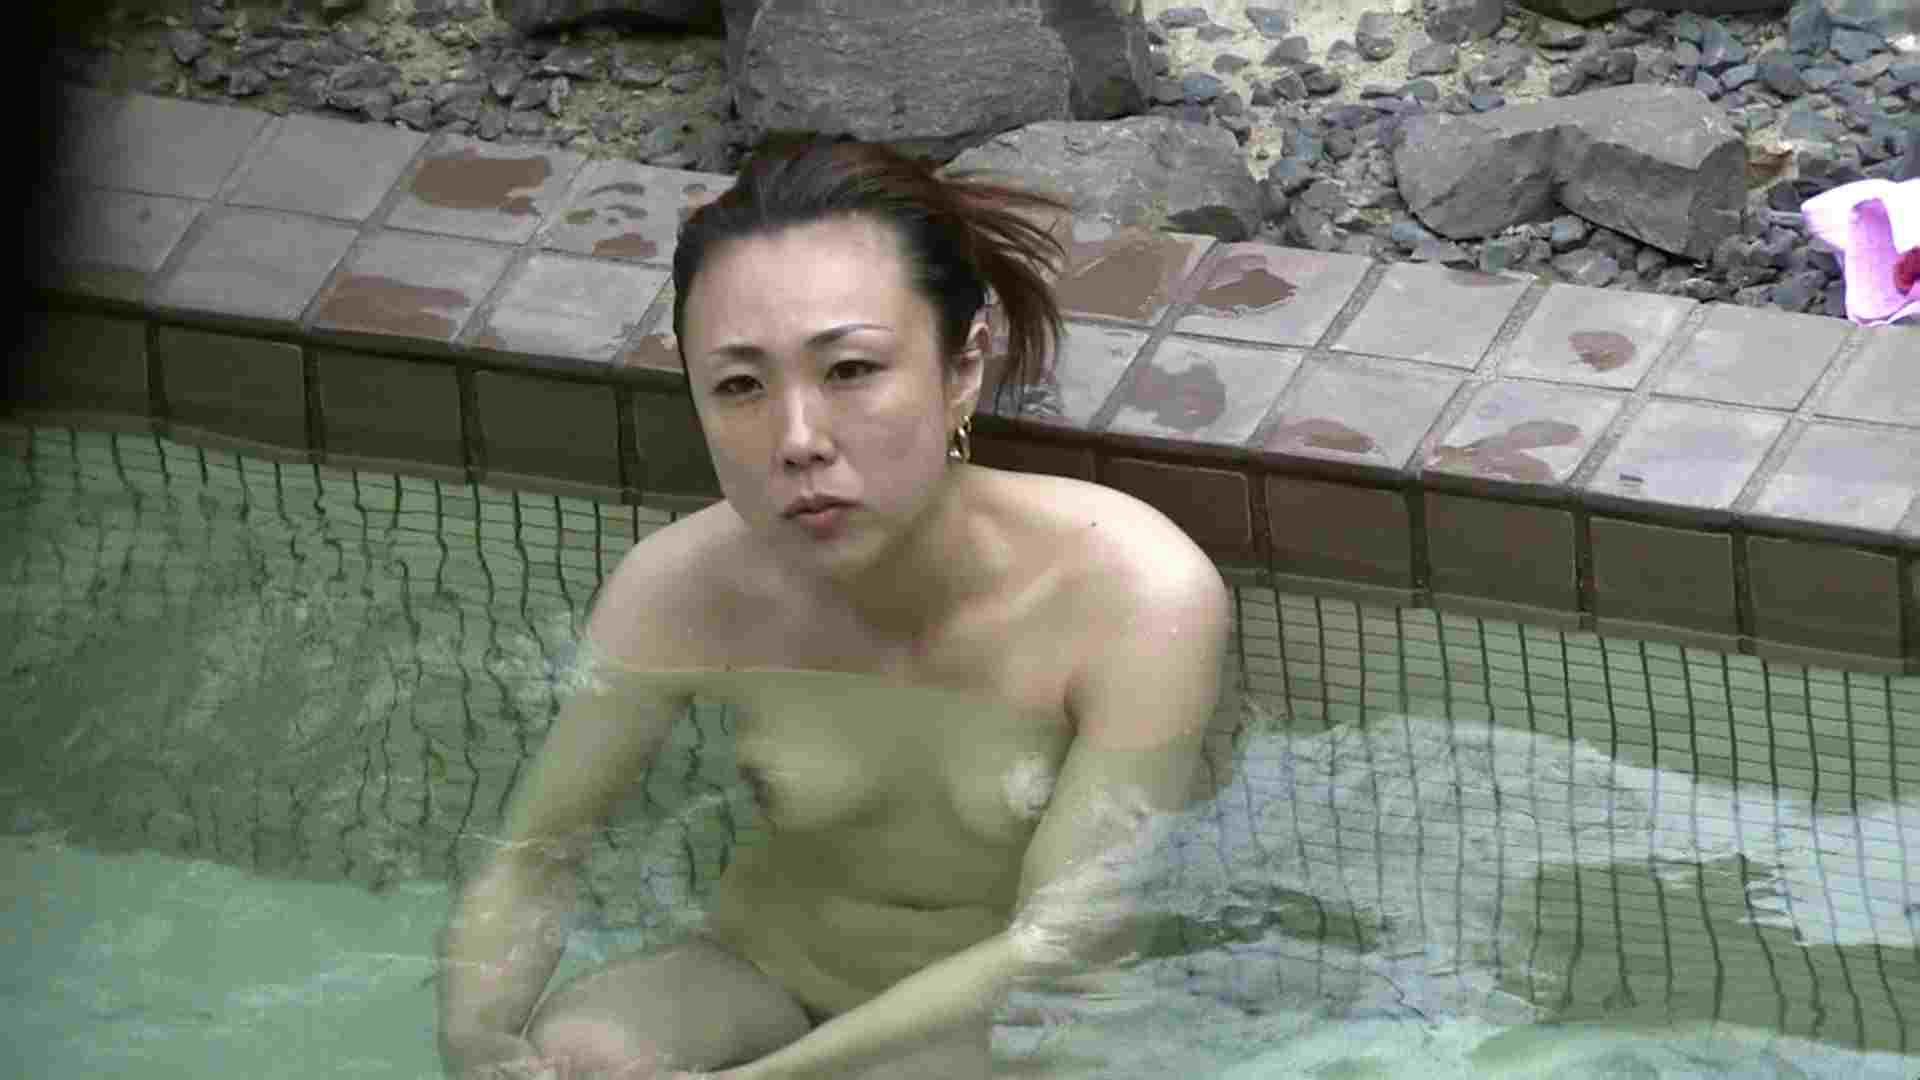 Aquaな露天風呂Vol.654 OLすけべ画像   盗撮  38連発 31